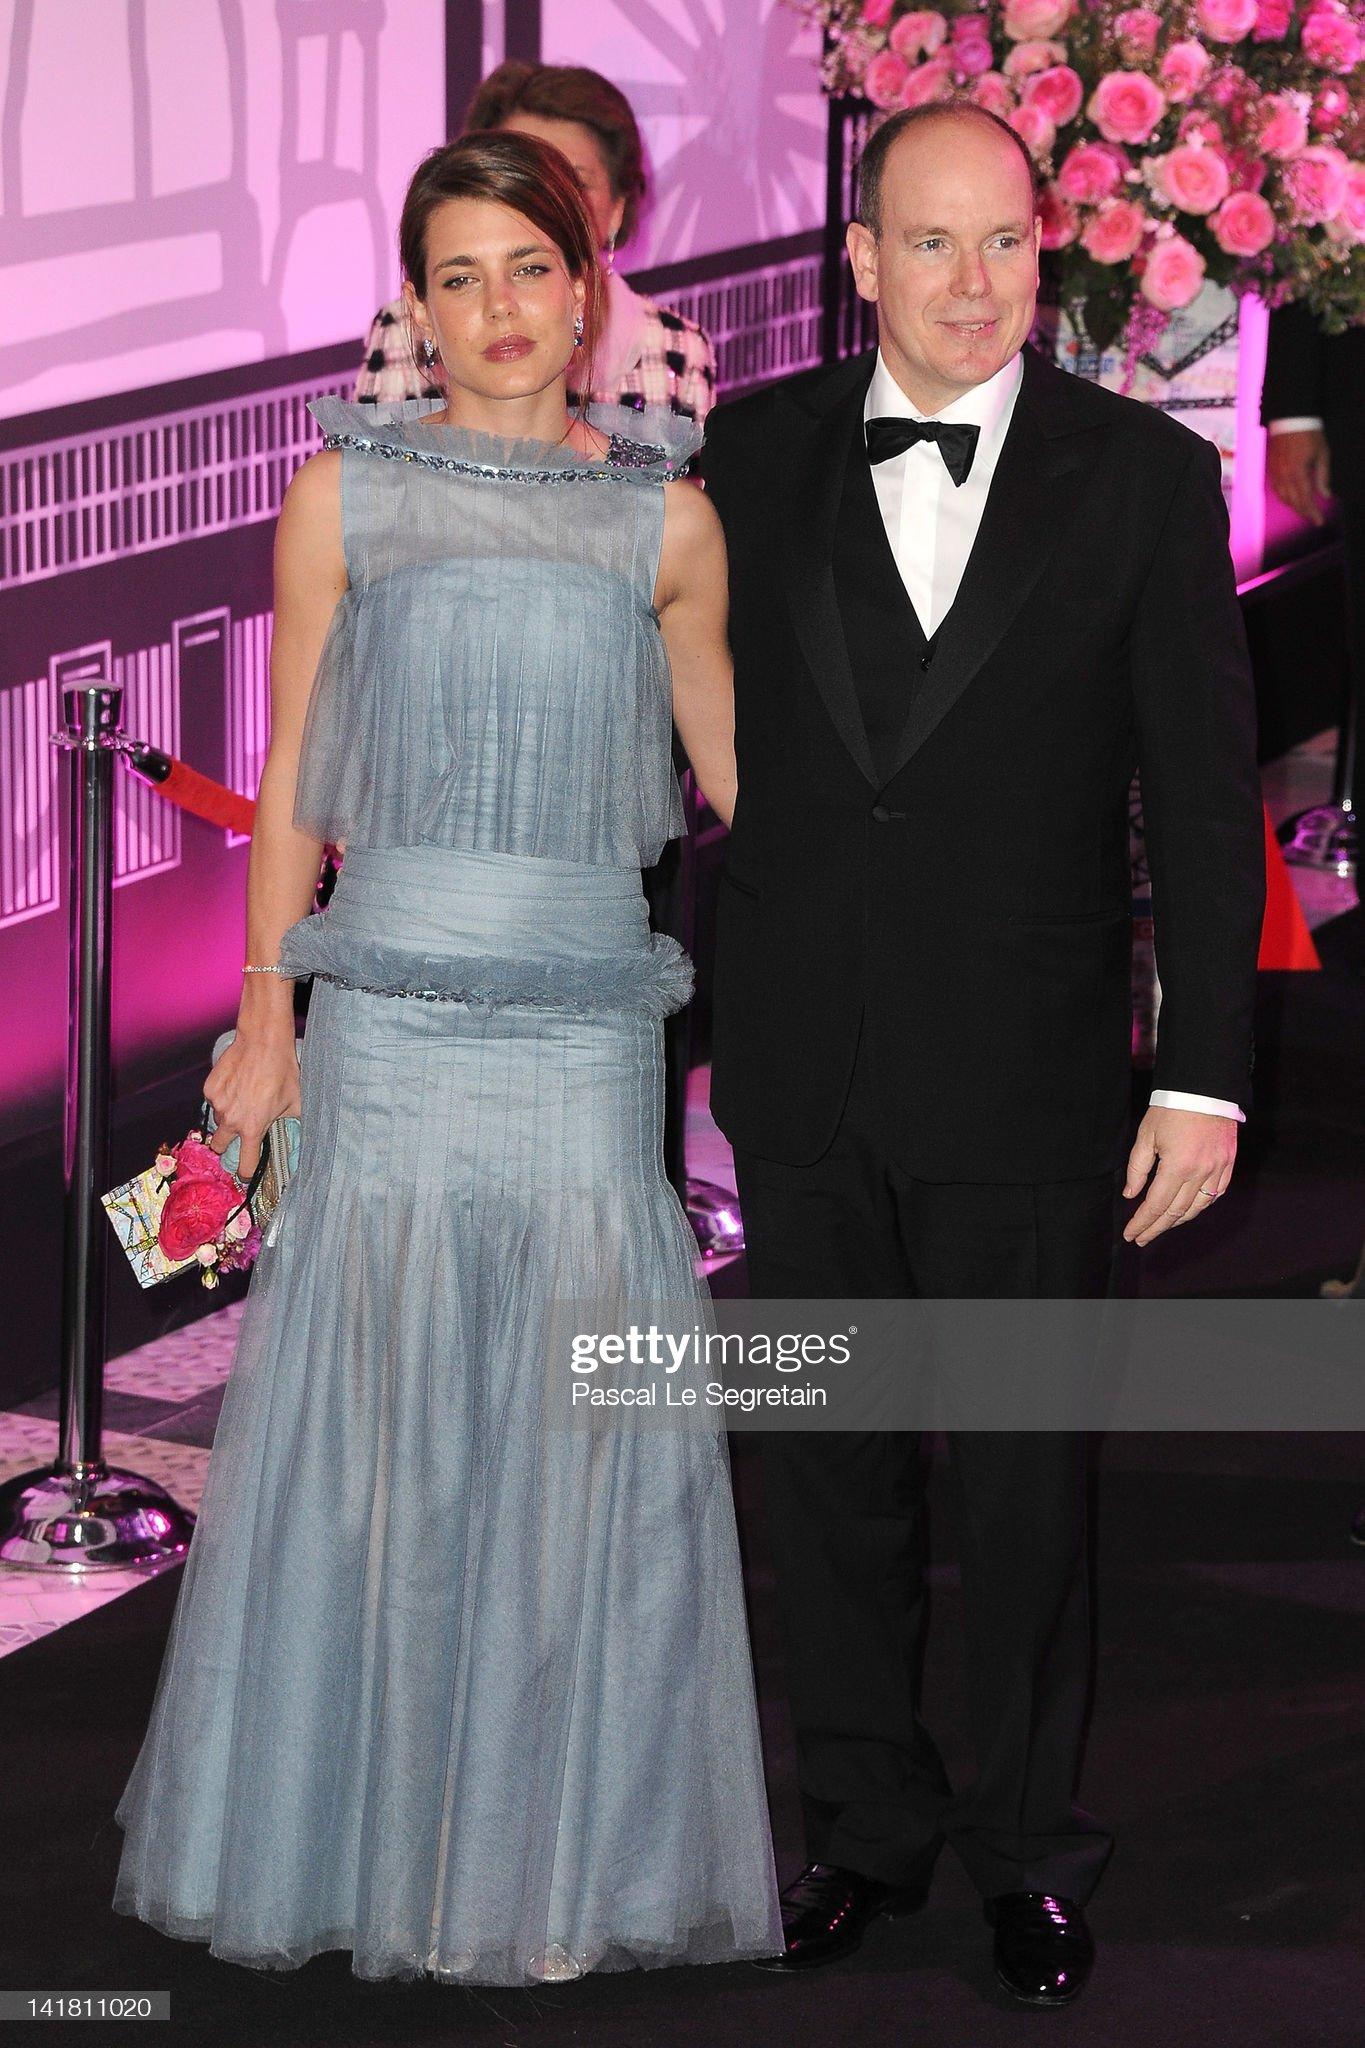 Monaco Rose Ball 2012 : News Photo